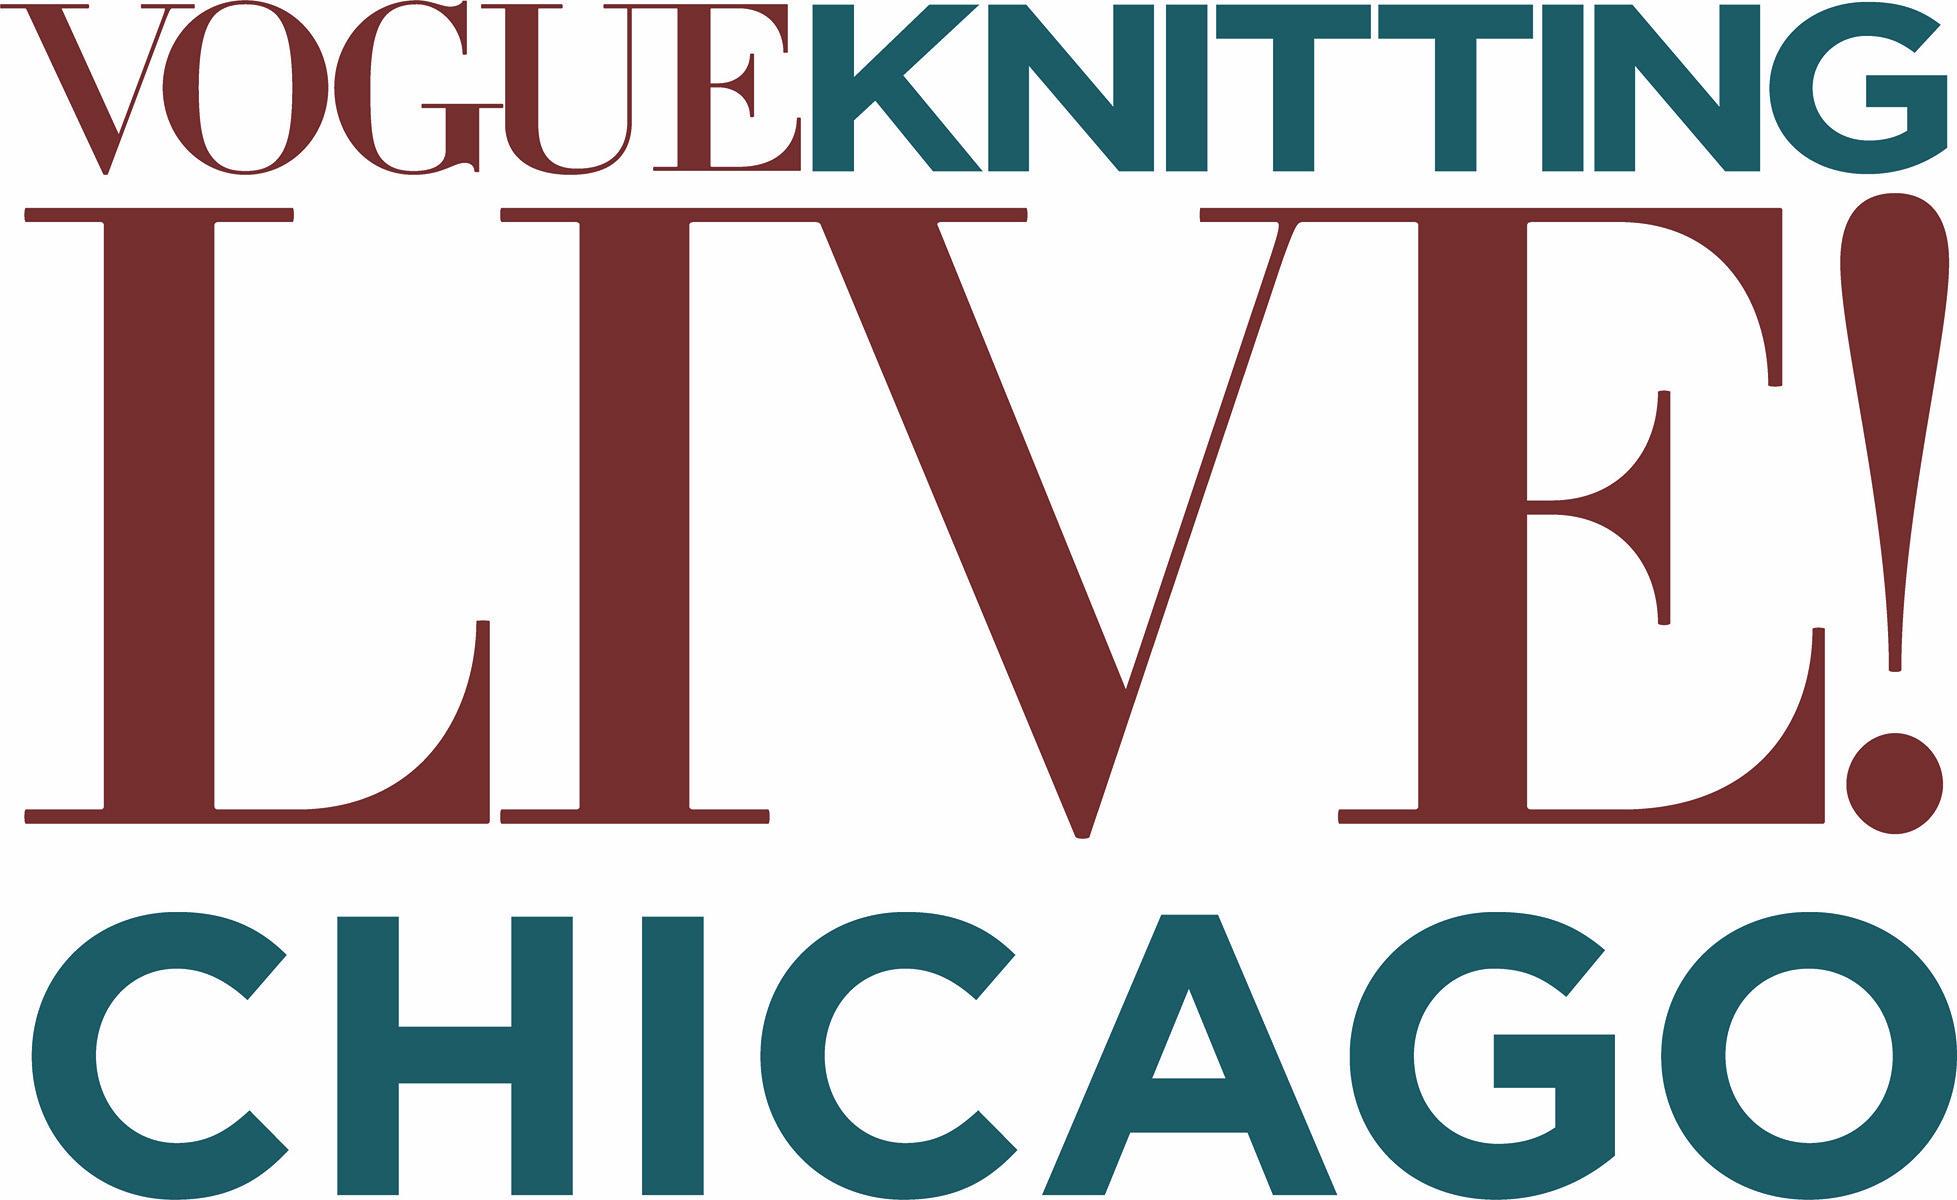 Register now for Vogue Knitting Live Chicago!  Register Here .